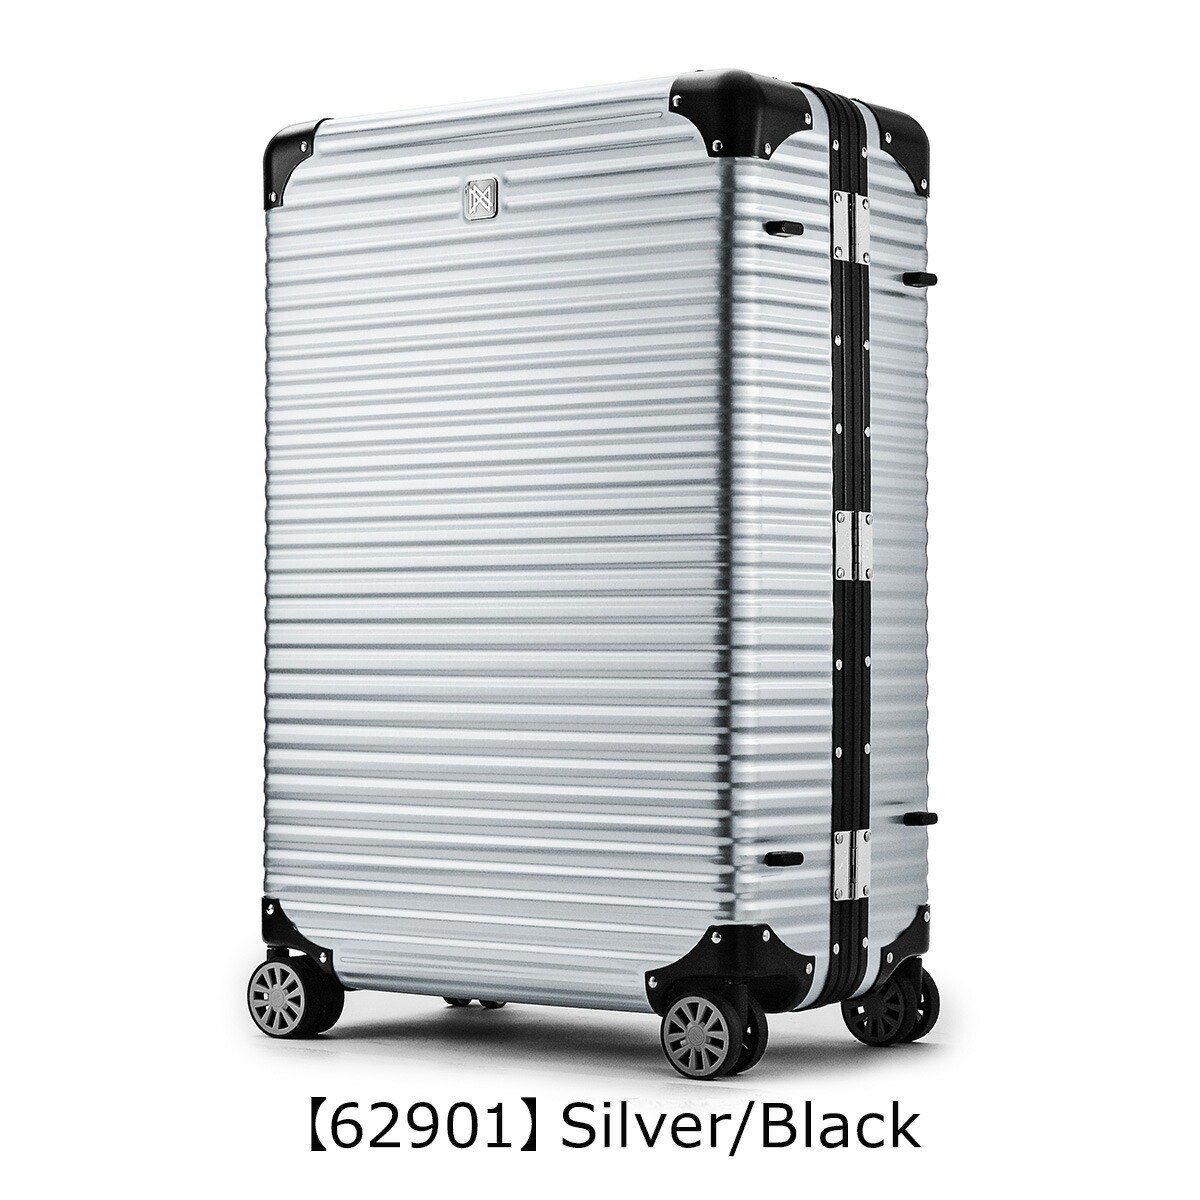 【62901】Silver/Black